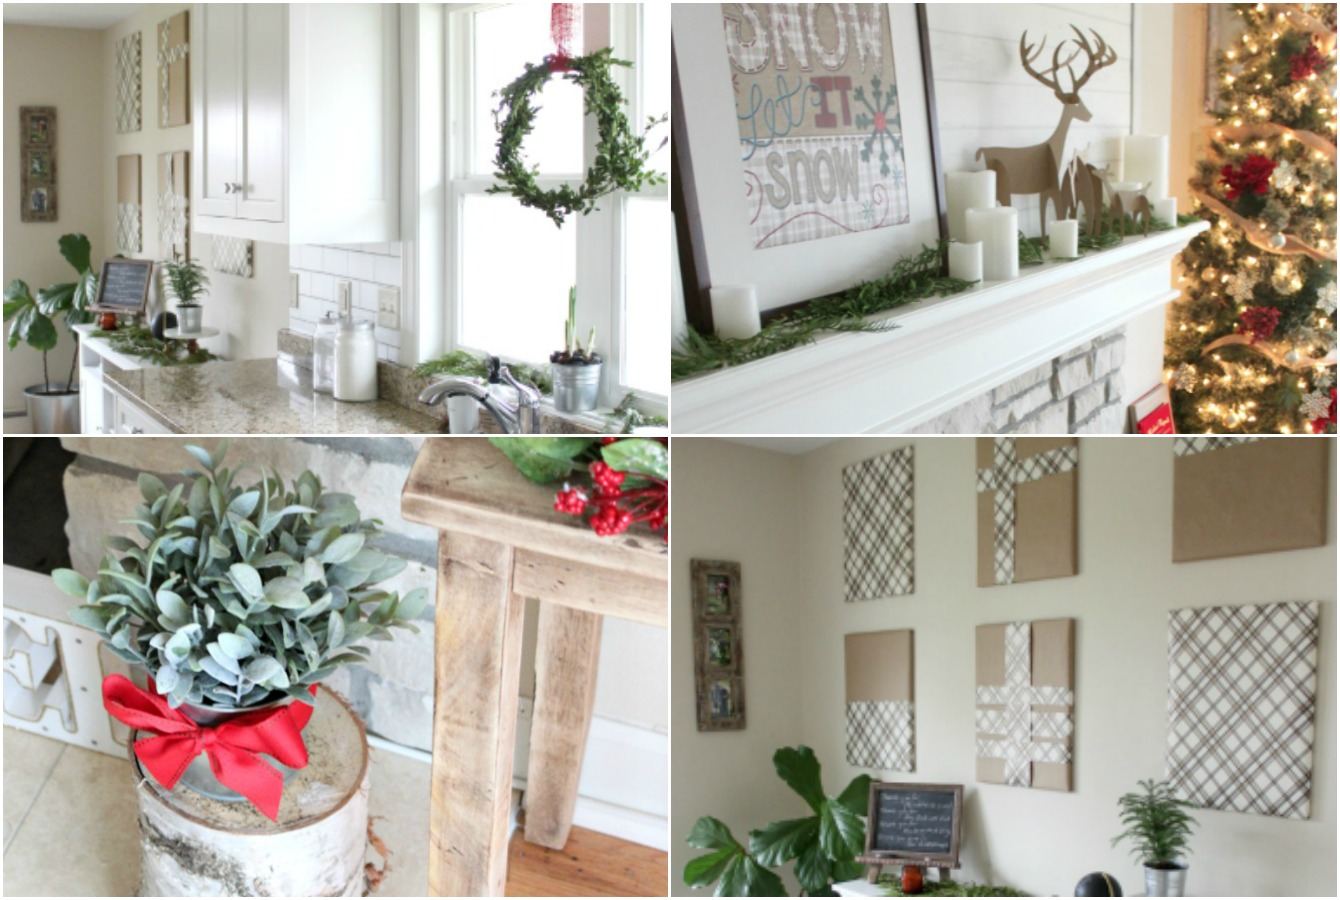 Tips for Inexpensive Christmas Decor - Farmhouse Christmas